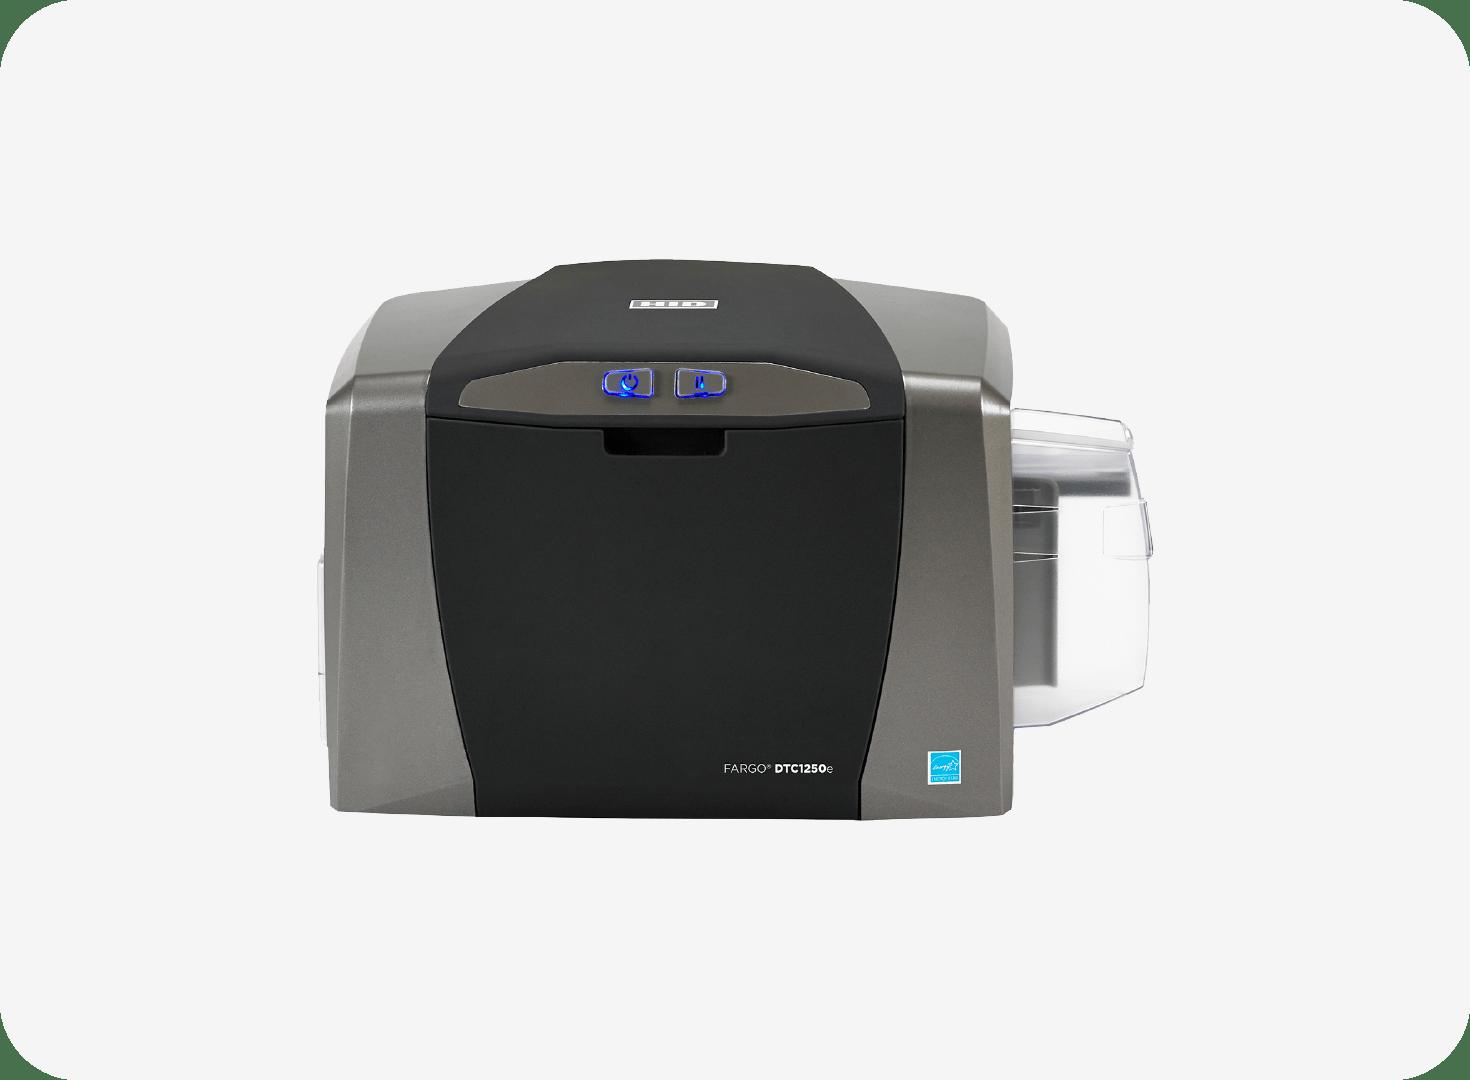 HID FARGO DTC1250e ID Direct to Card Printer & Encoder